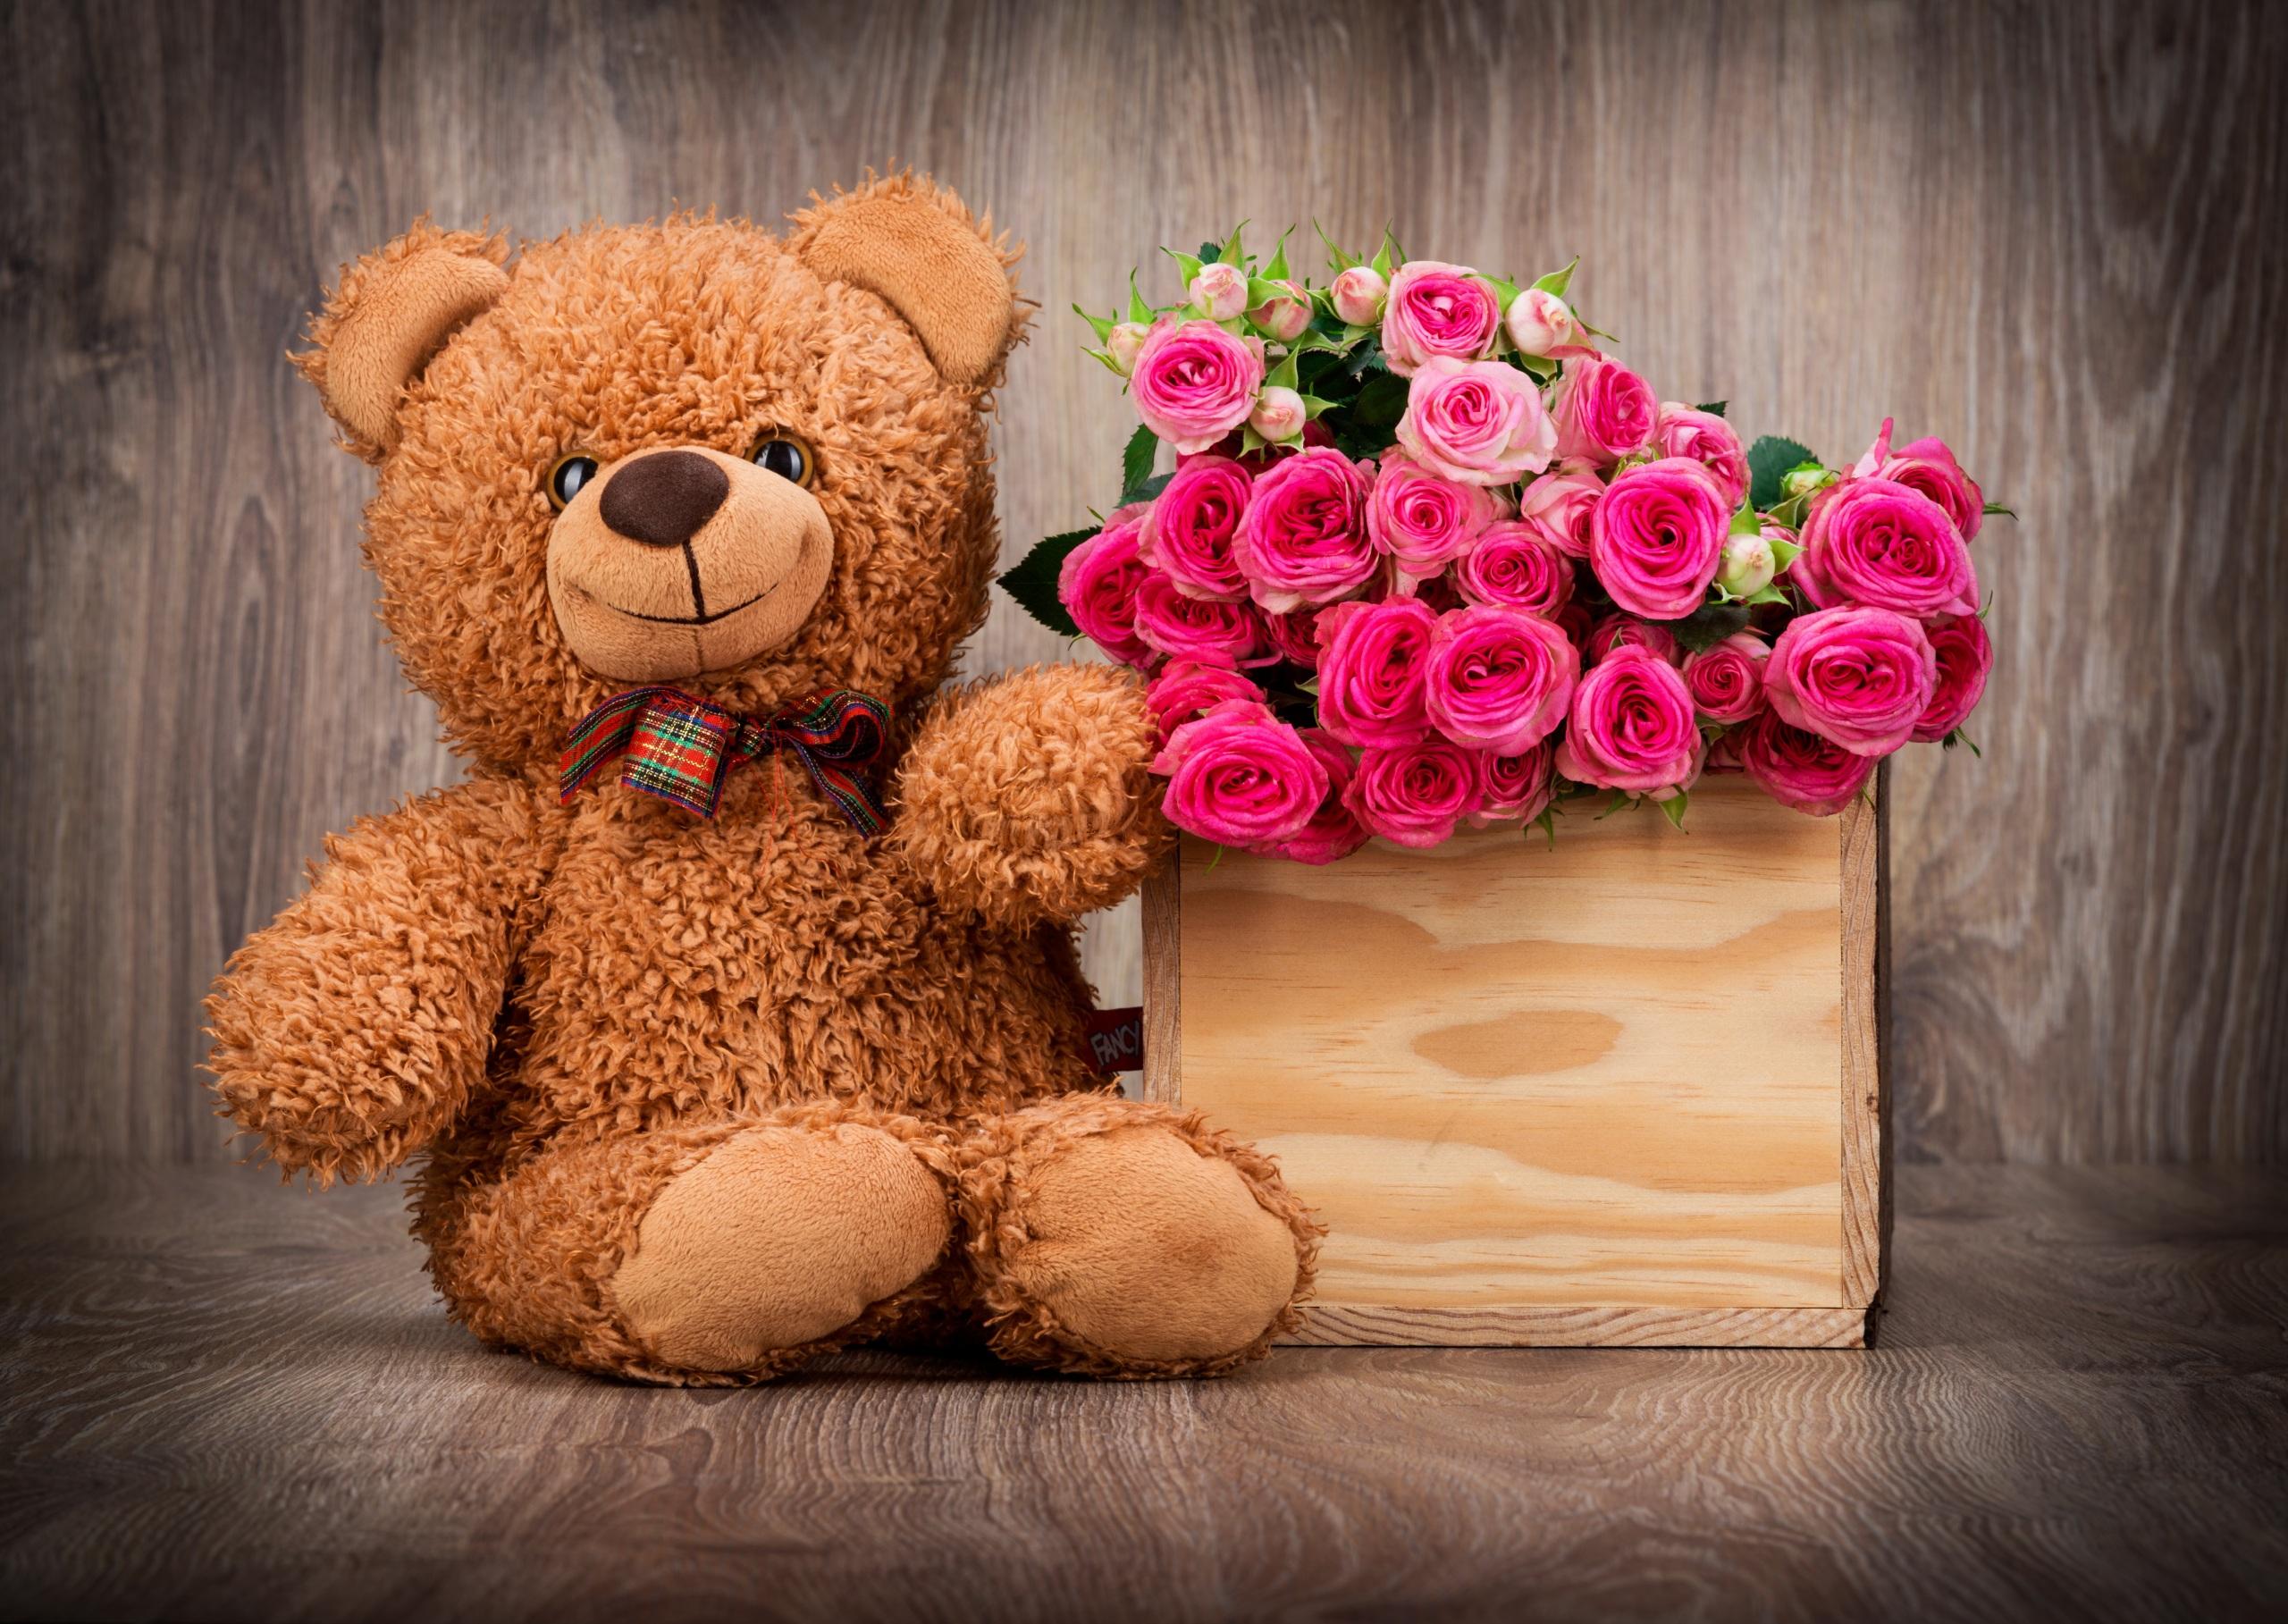 cute teddy bears wallpaper wallpapersafari. Black Bedroom Furniture Sets. Home Design Ideas